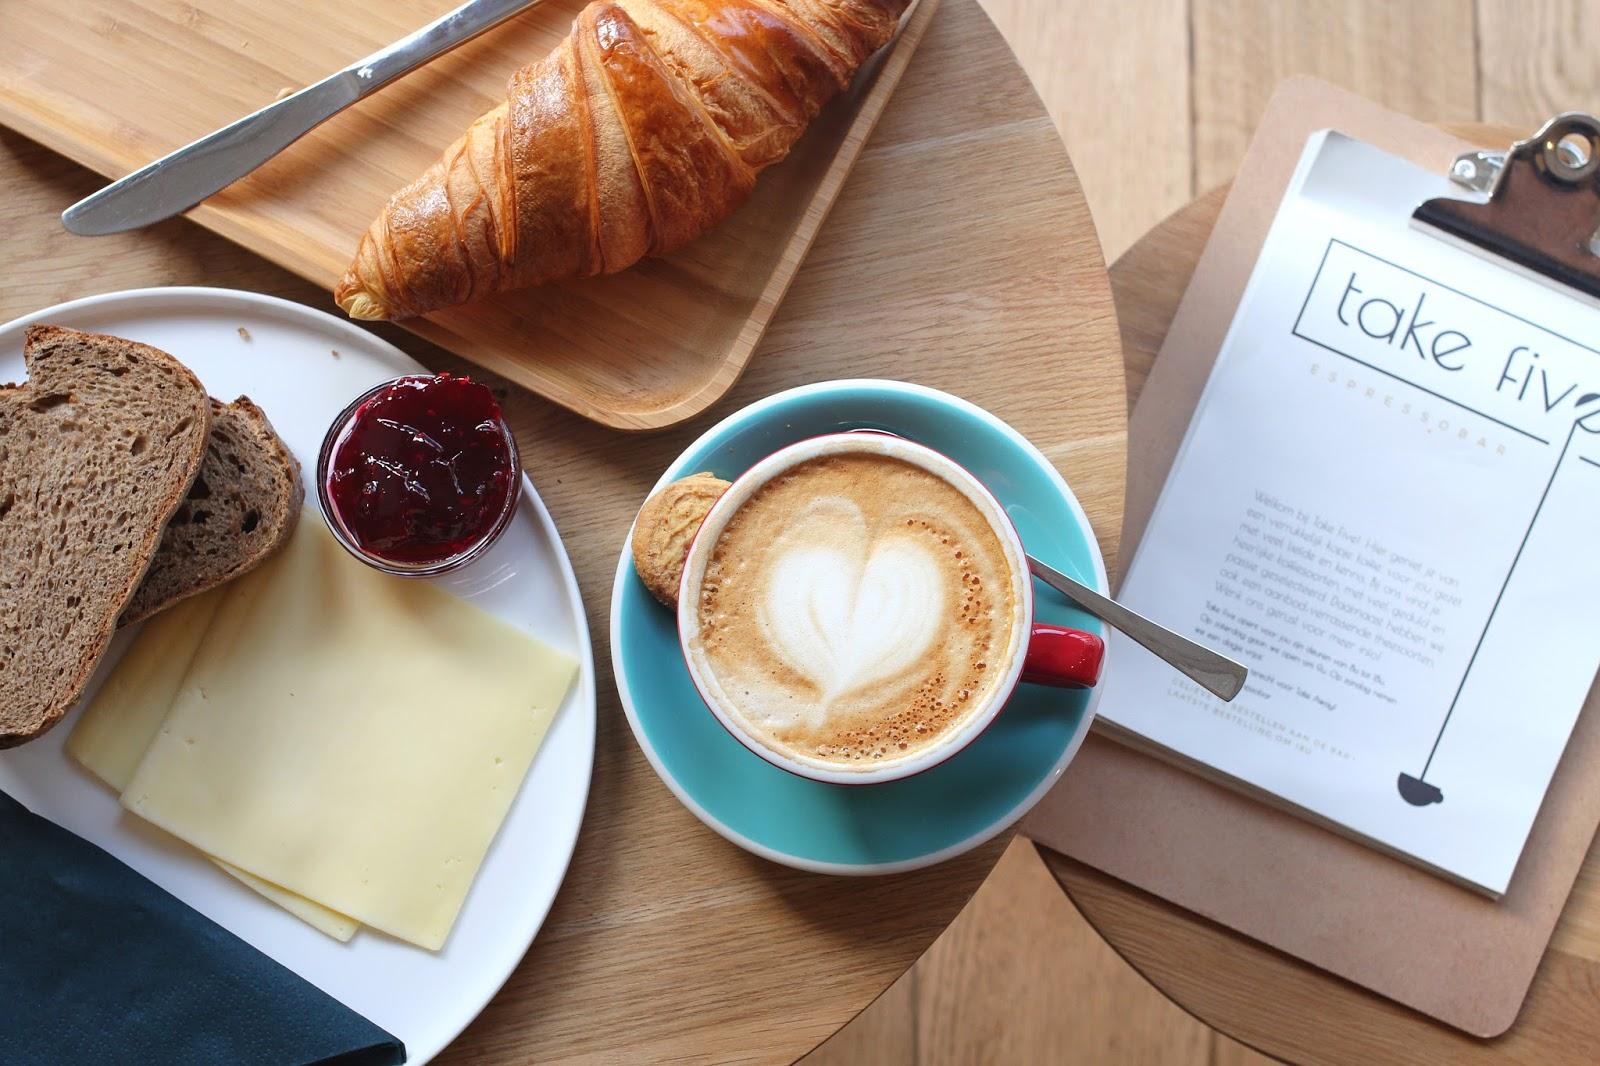 5 favorite coffee spots in Ghent